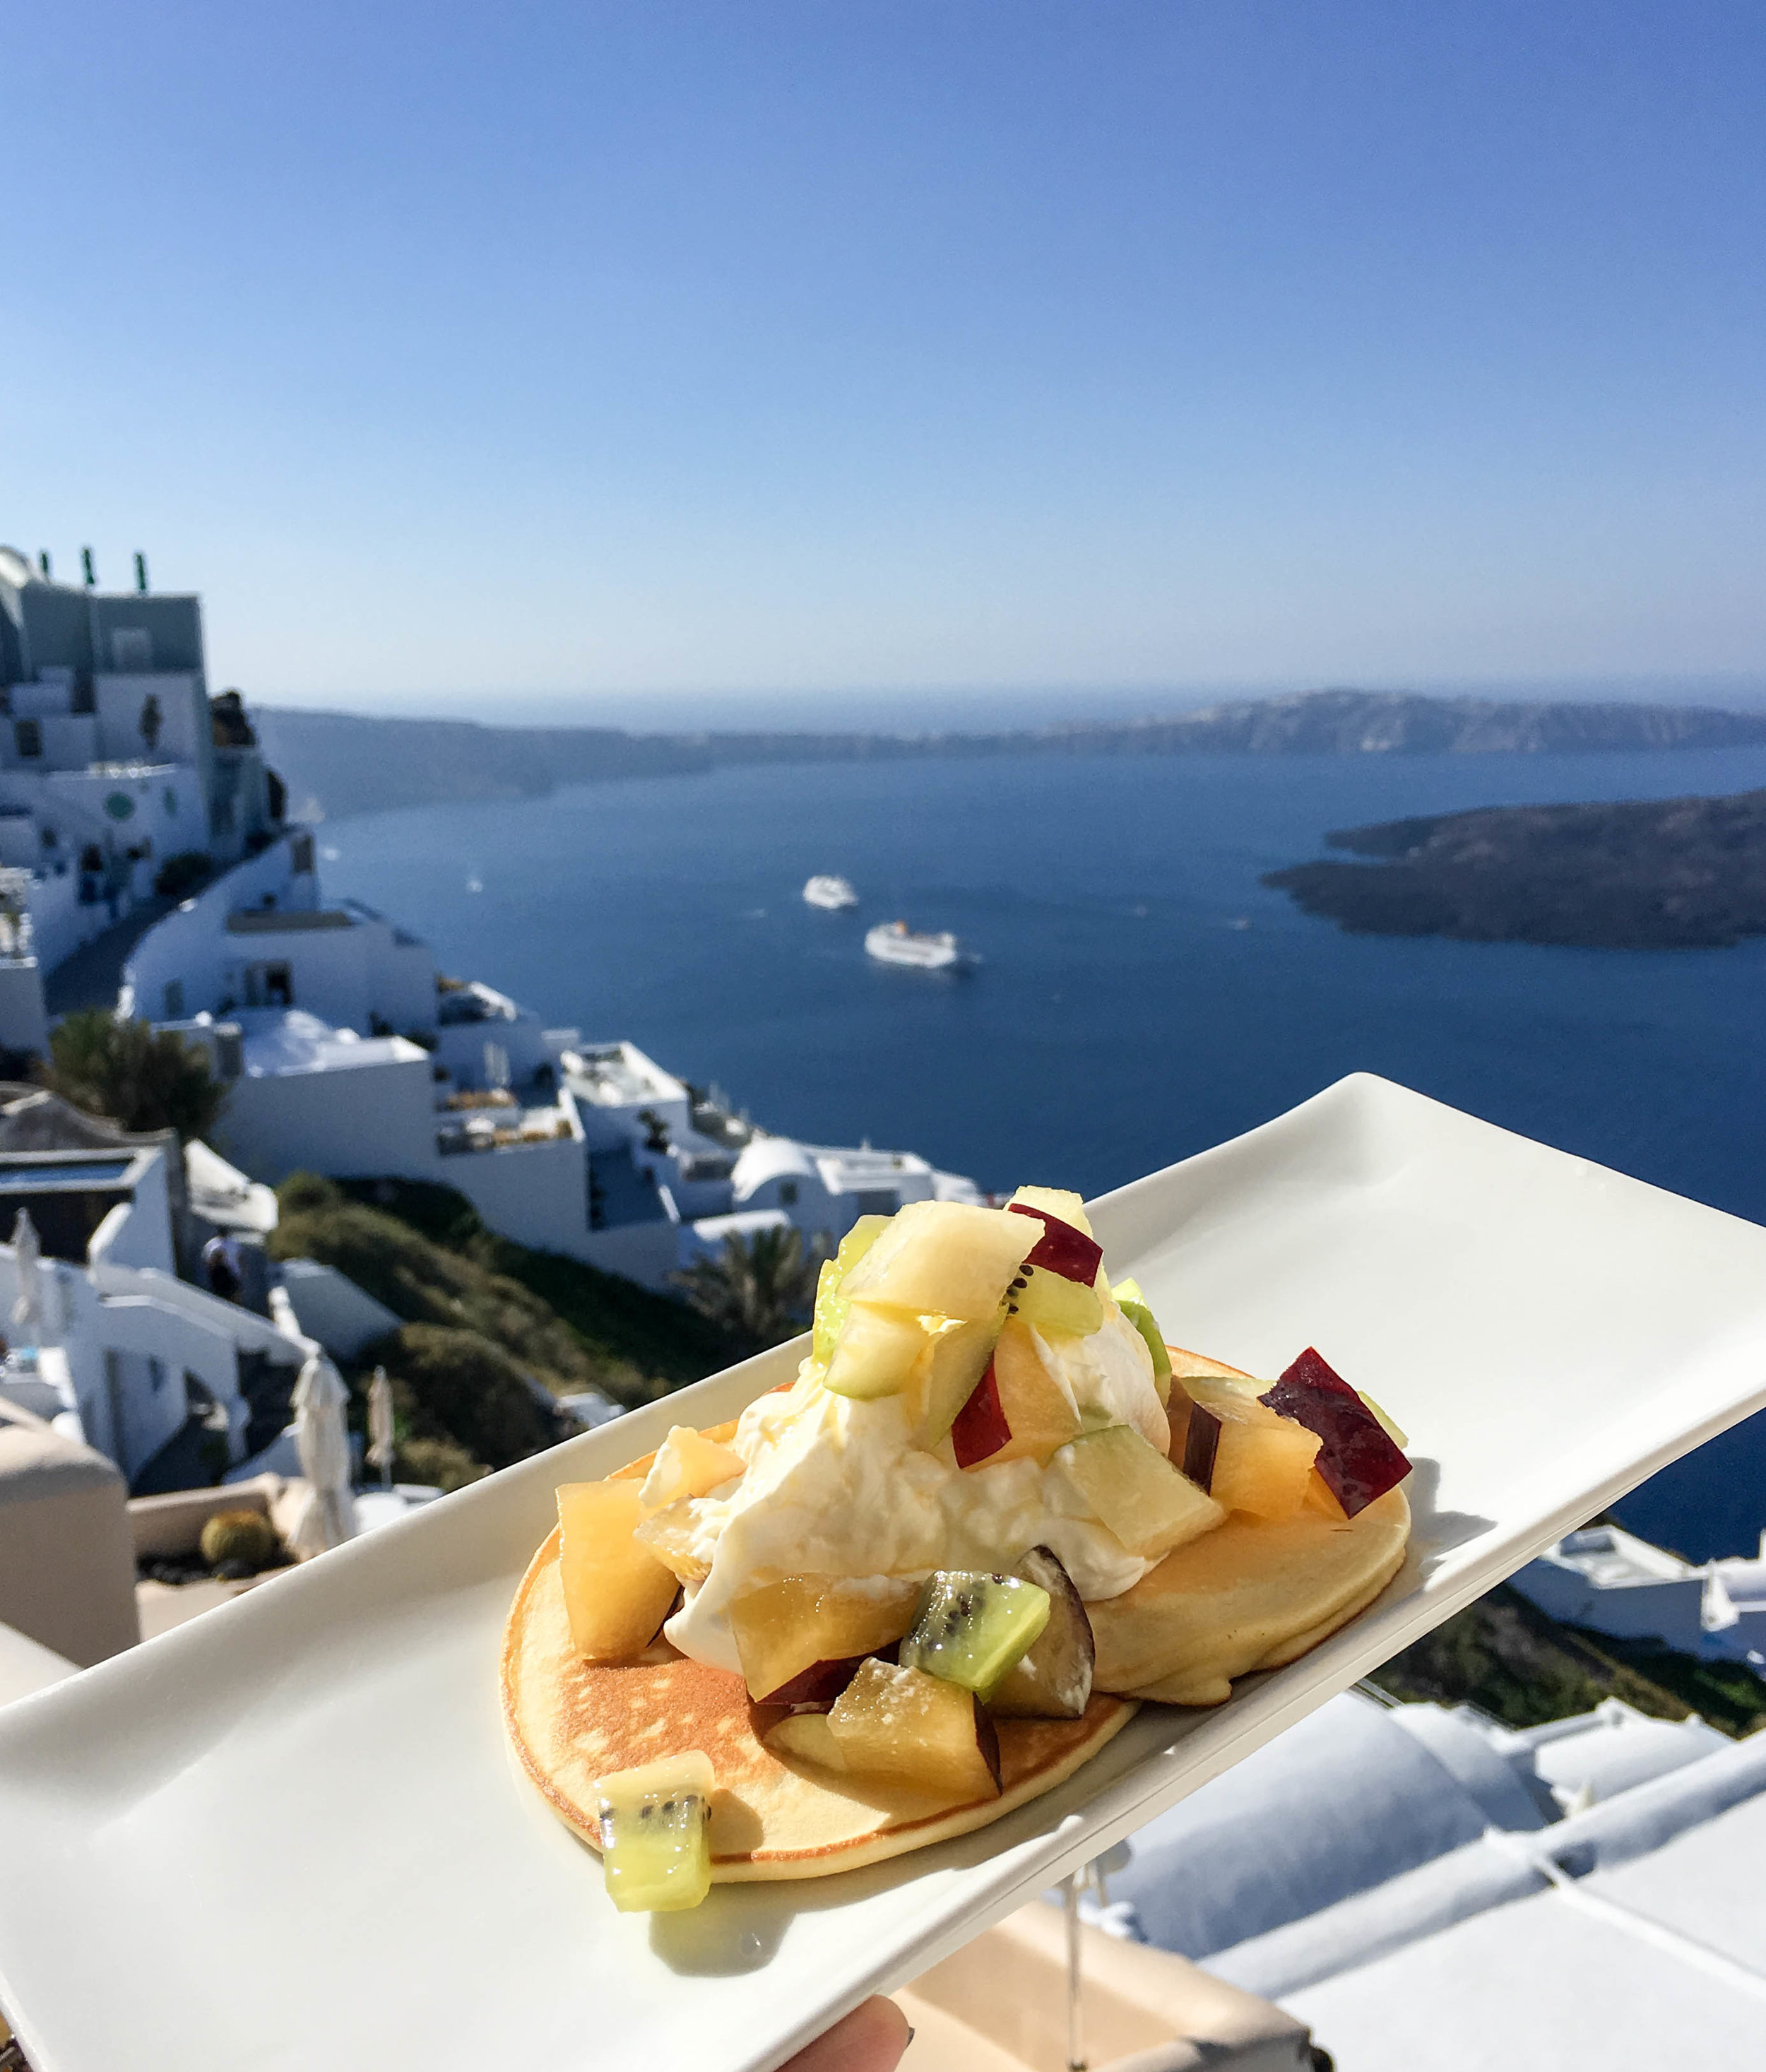 Pancakes with fruit and yogurt at Kapari Natural Resort, Santorini, Greece